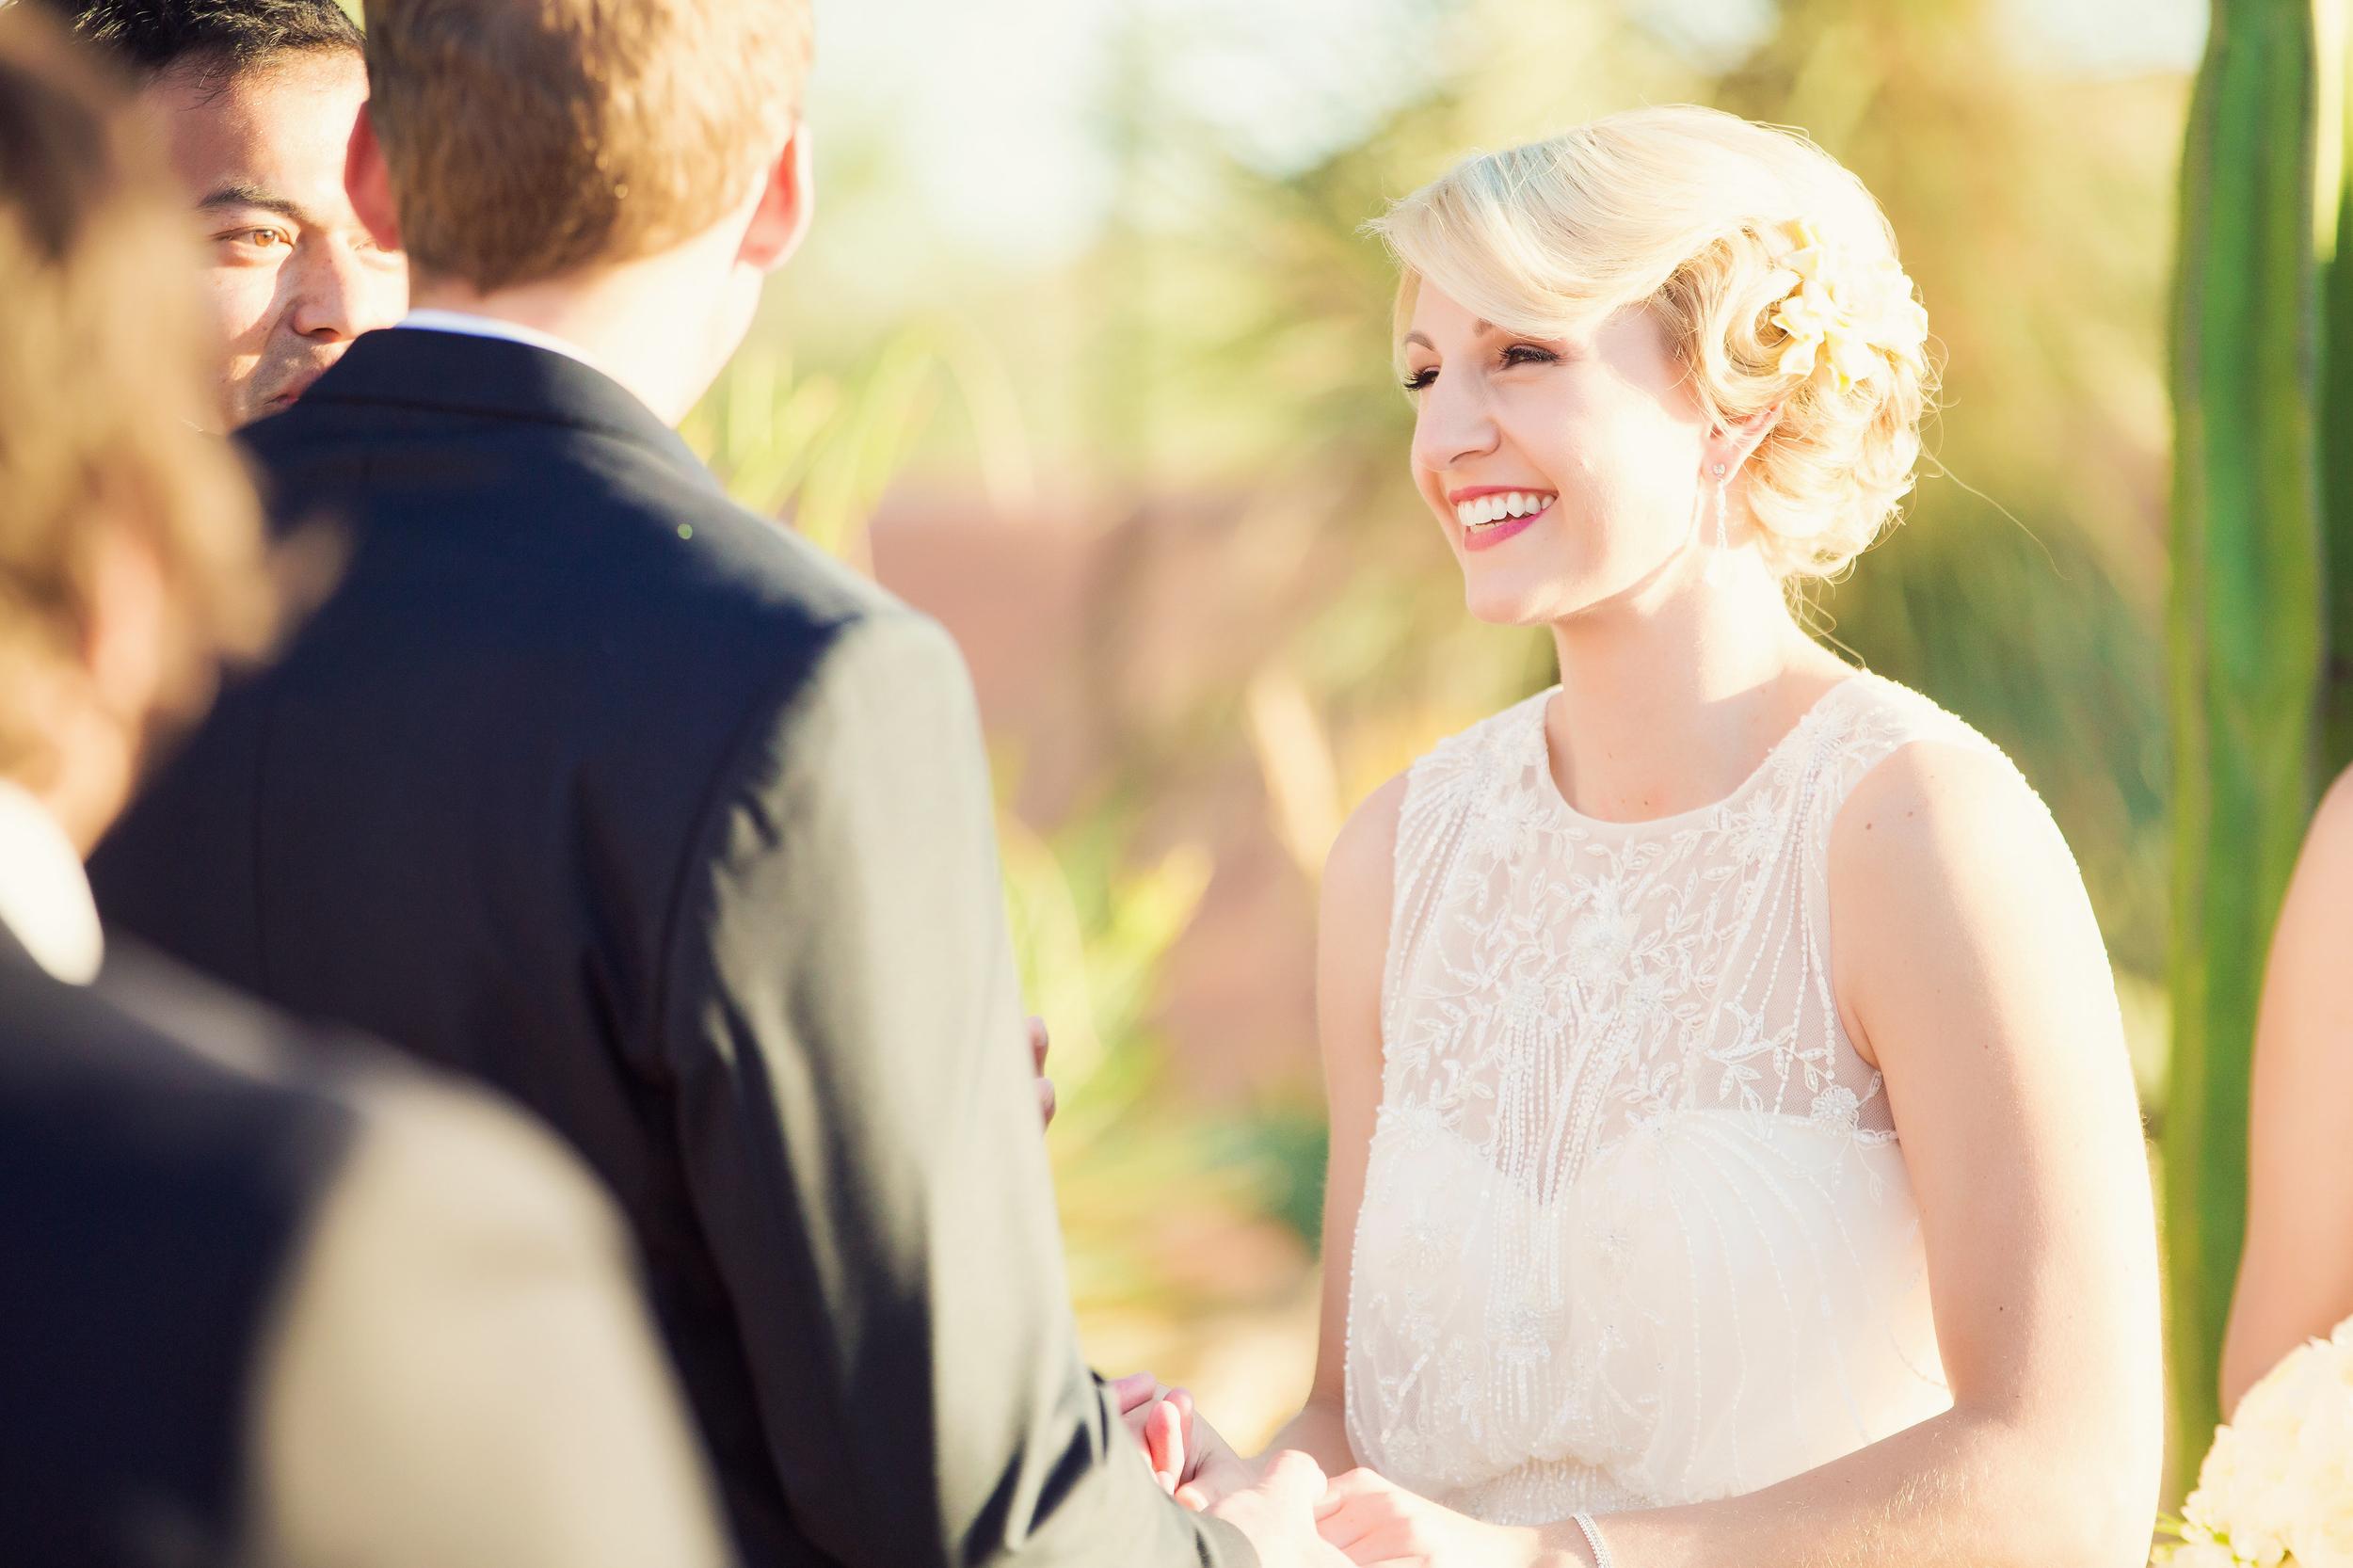 arizona-wedding-planner-destination-wedding-sip-and-twirl.jpg